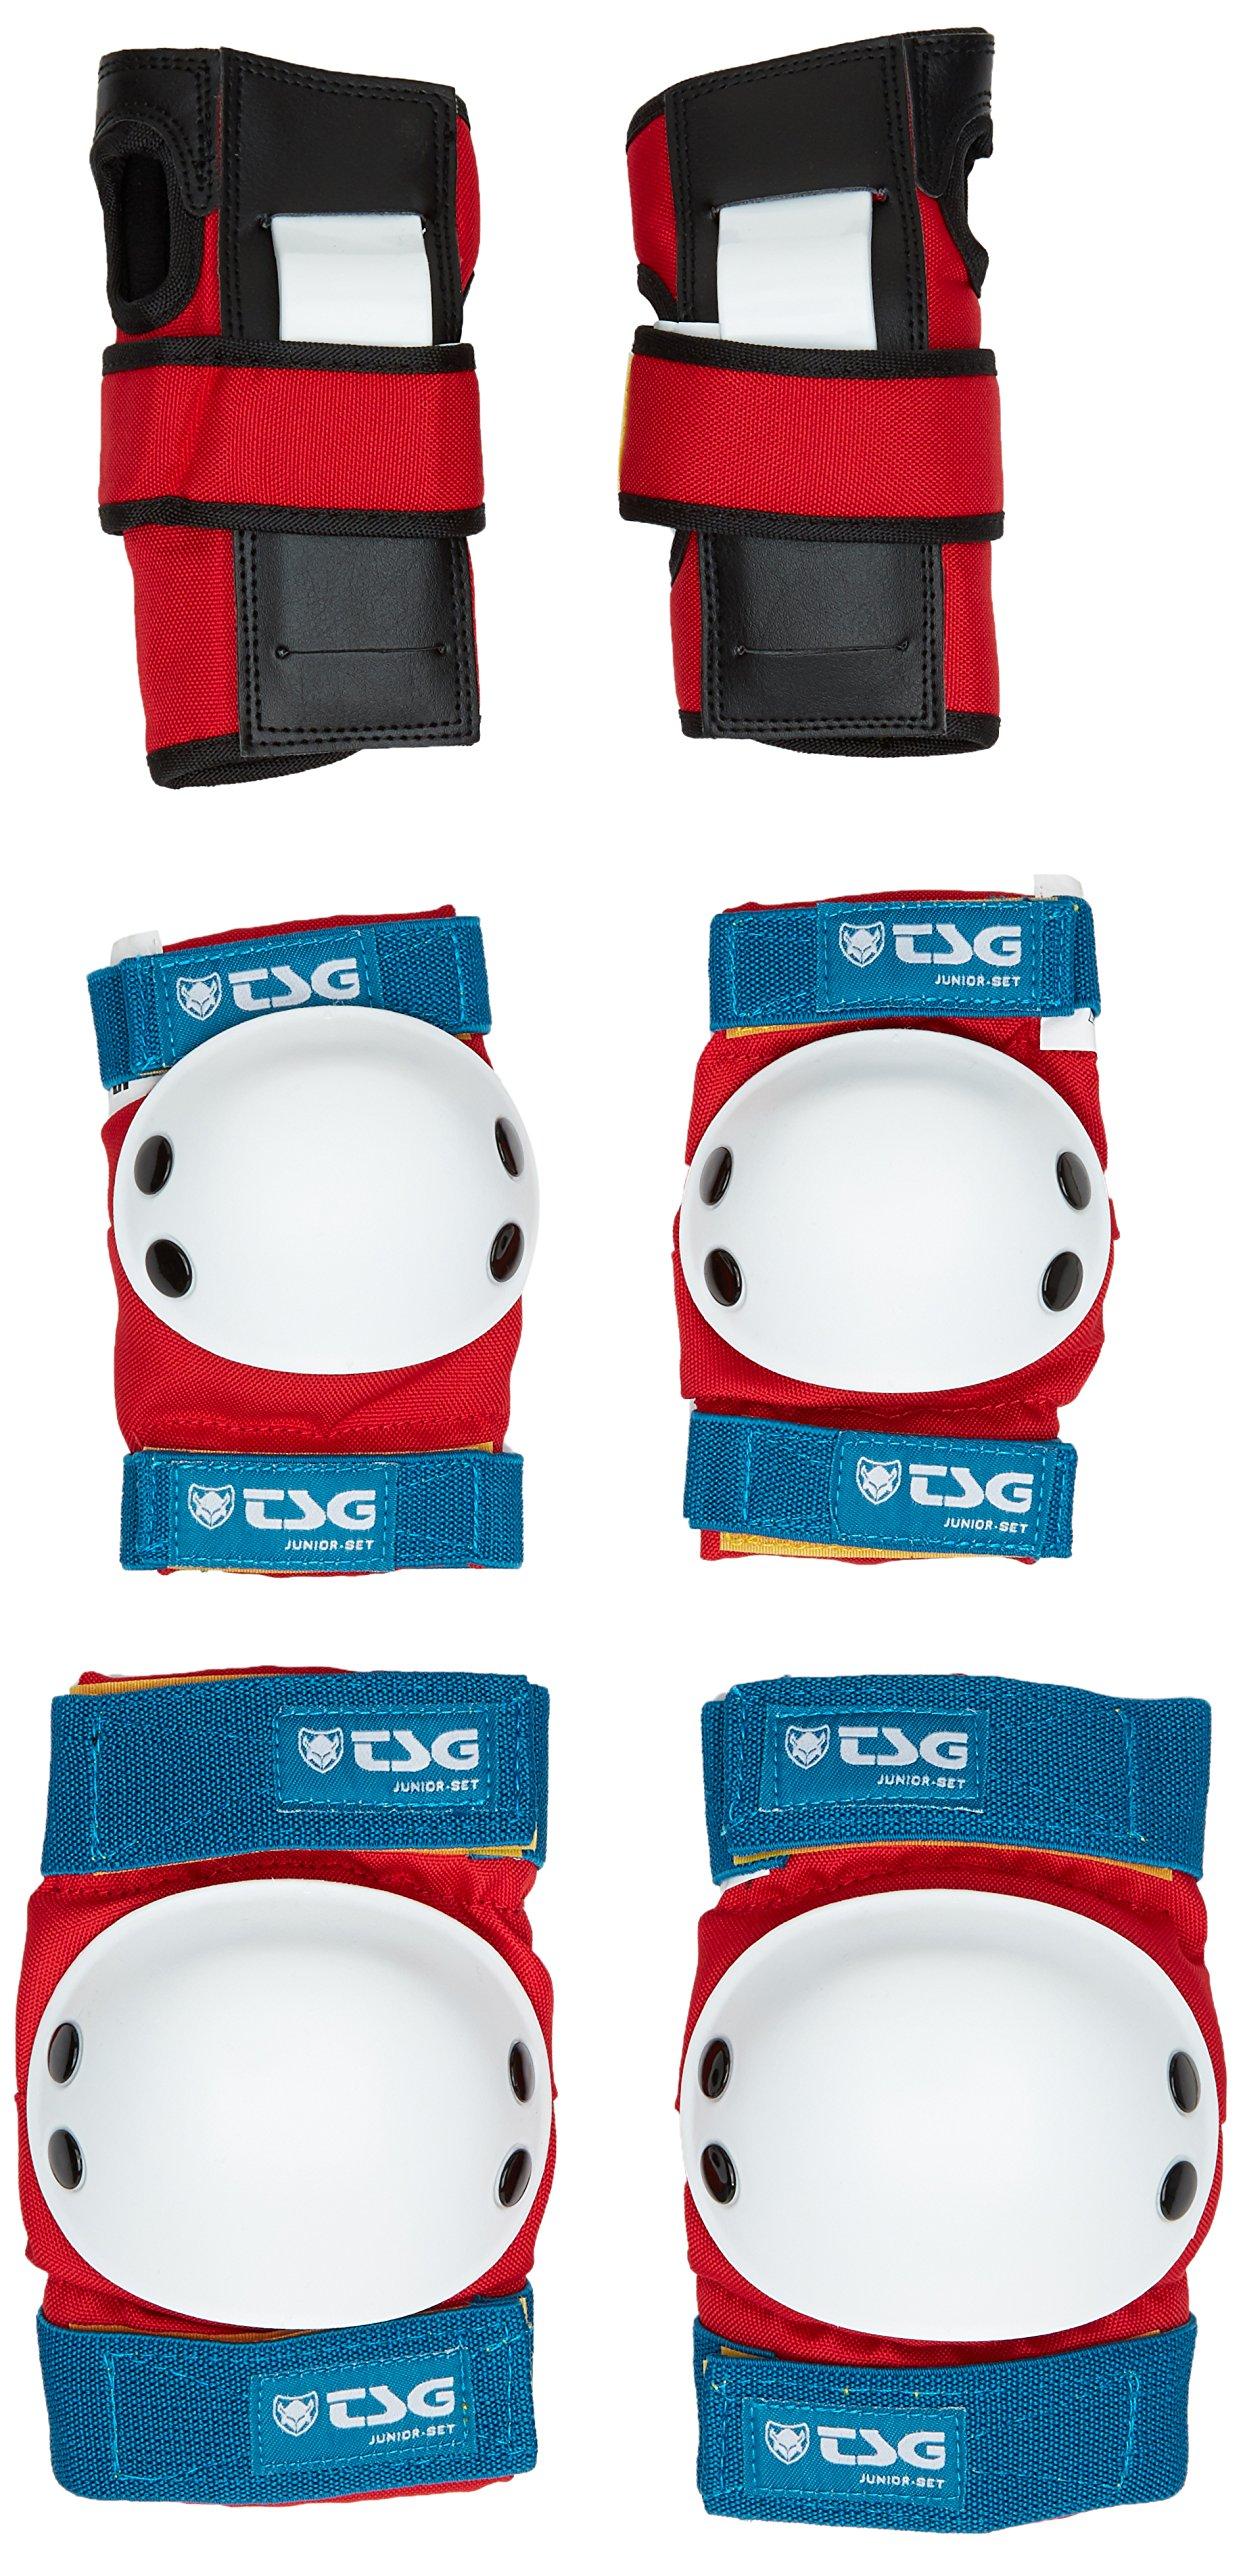 TSG - Junior-Set - Pads for Skateboard (red White Blue, one Size)